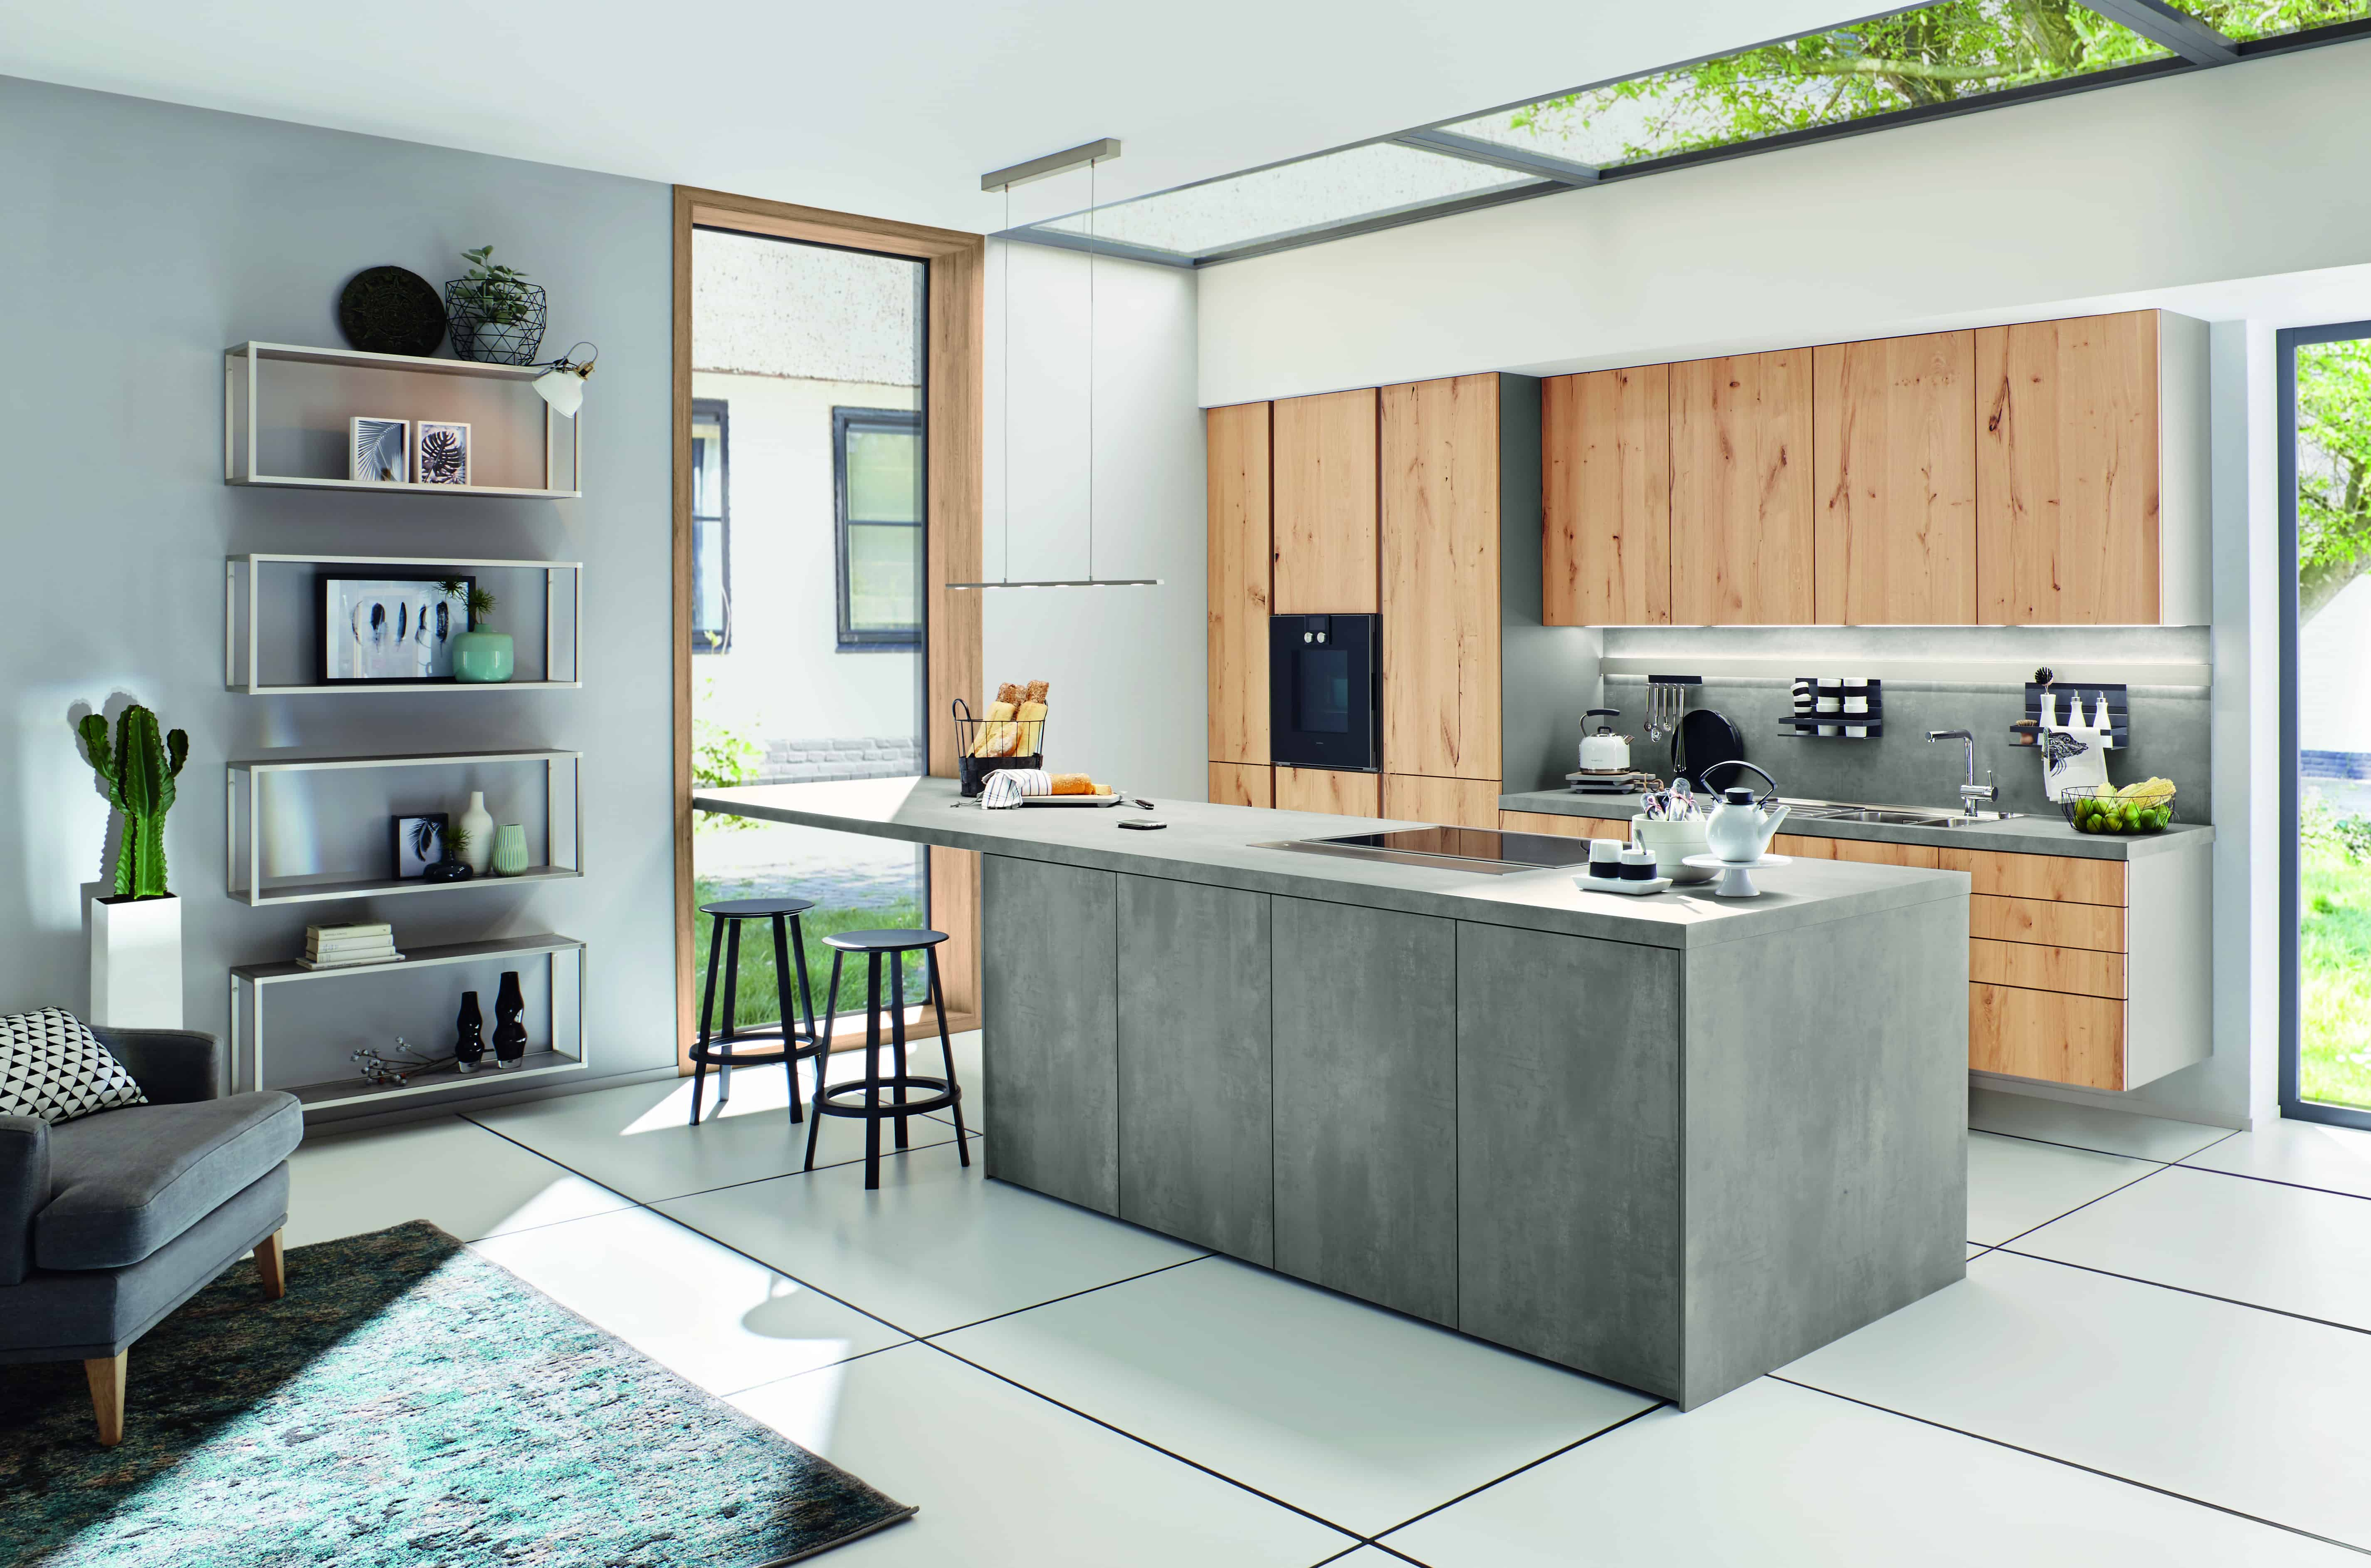 Keukens Half Geld : Betonlook keukens grootste showrooms van nl keukenwarenhuis